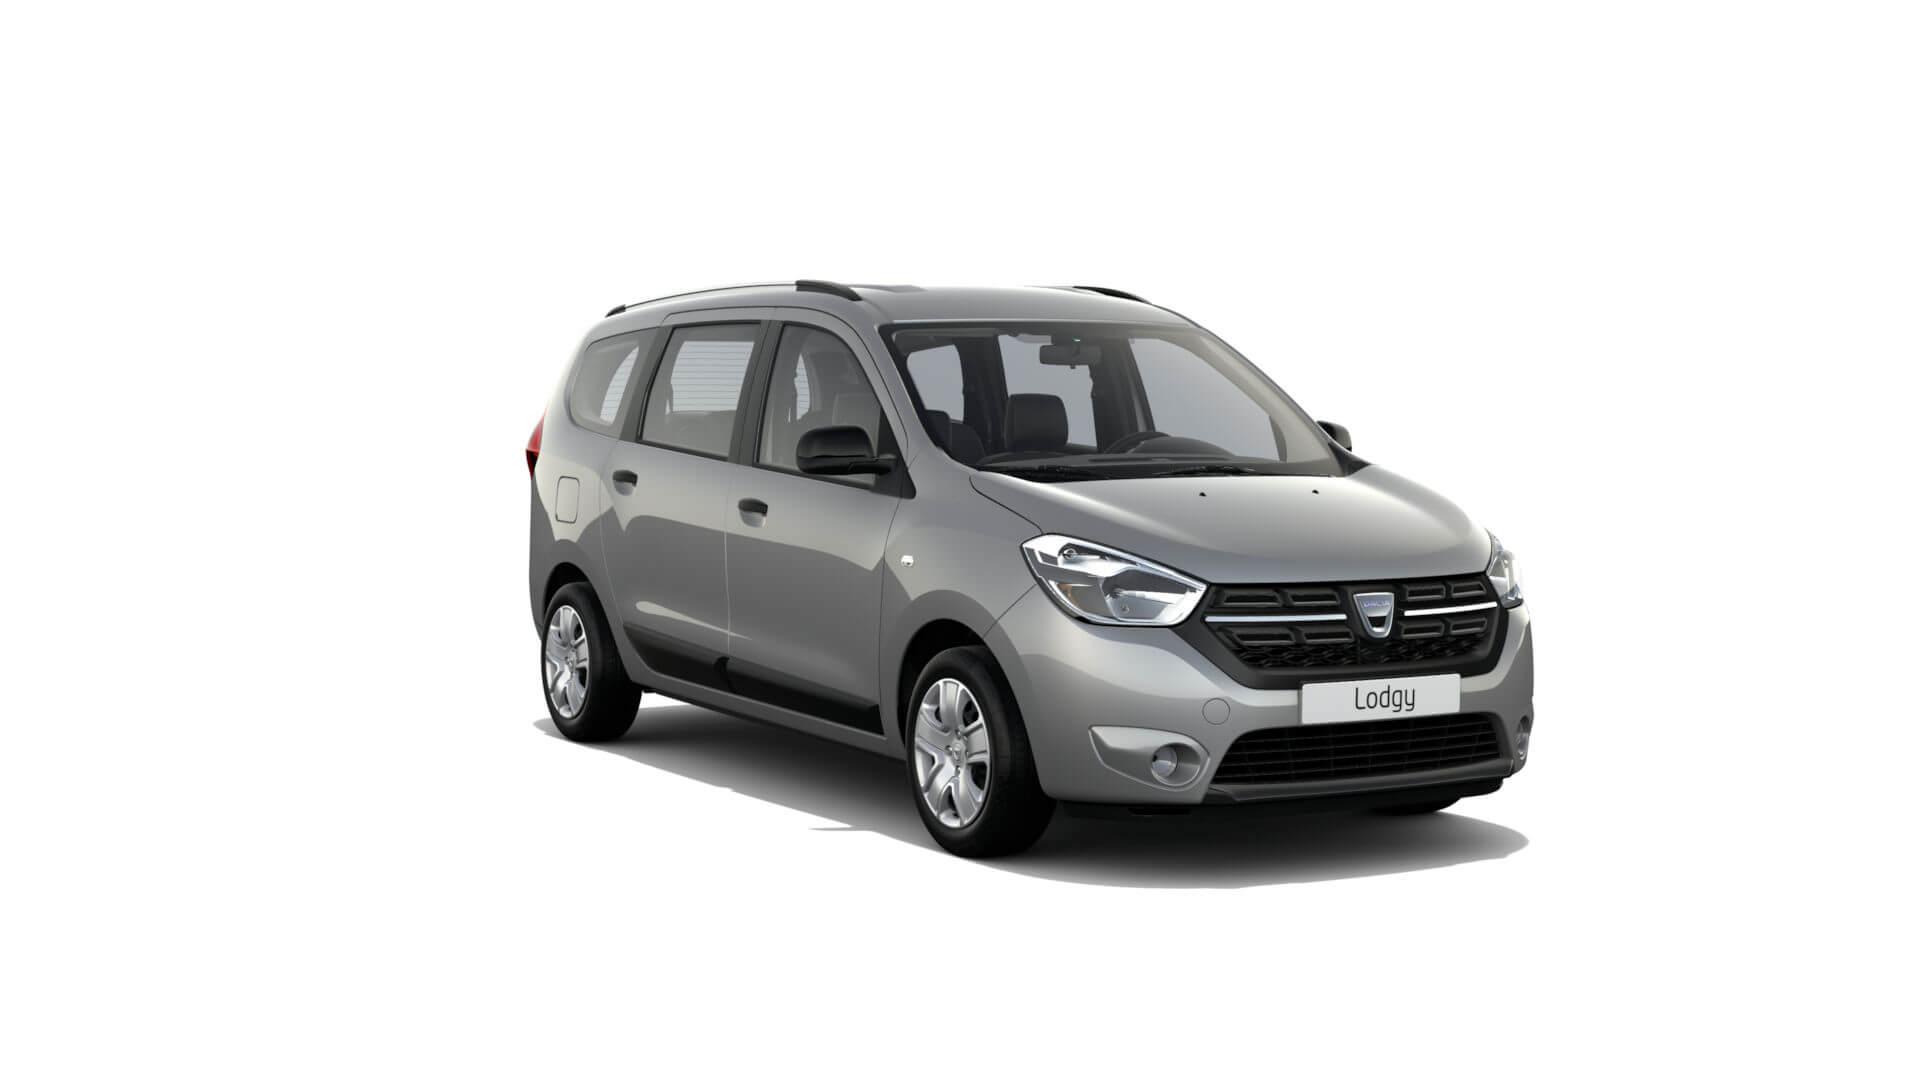 Automodell grau - Dacia Lodgy - Renault Ahrens Hannover